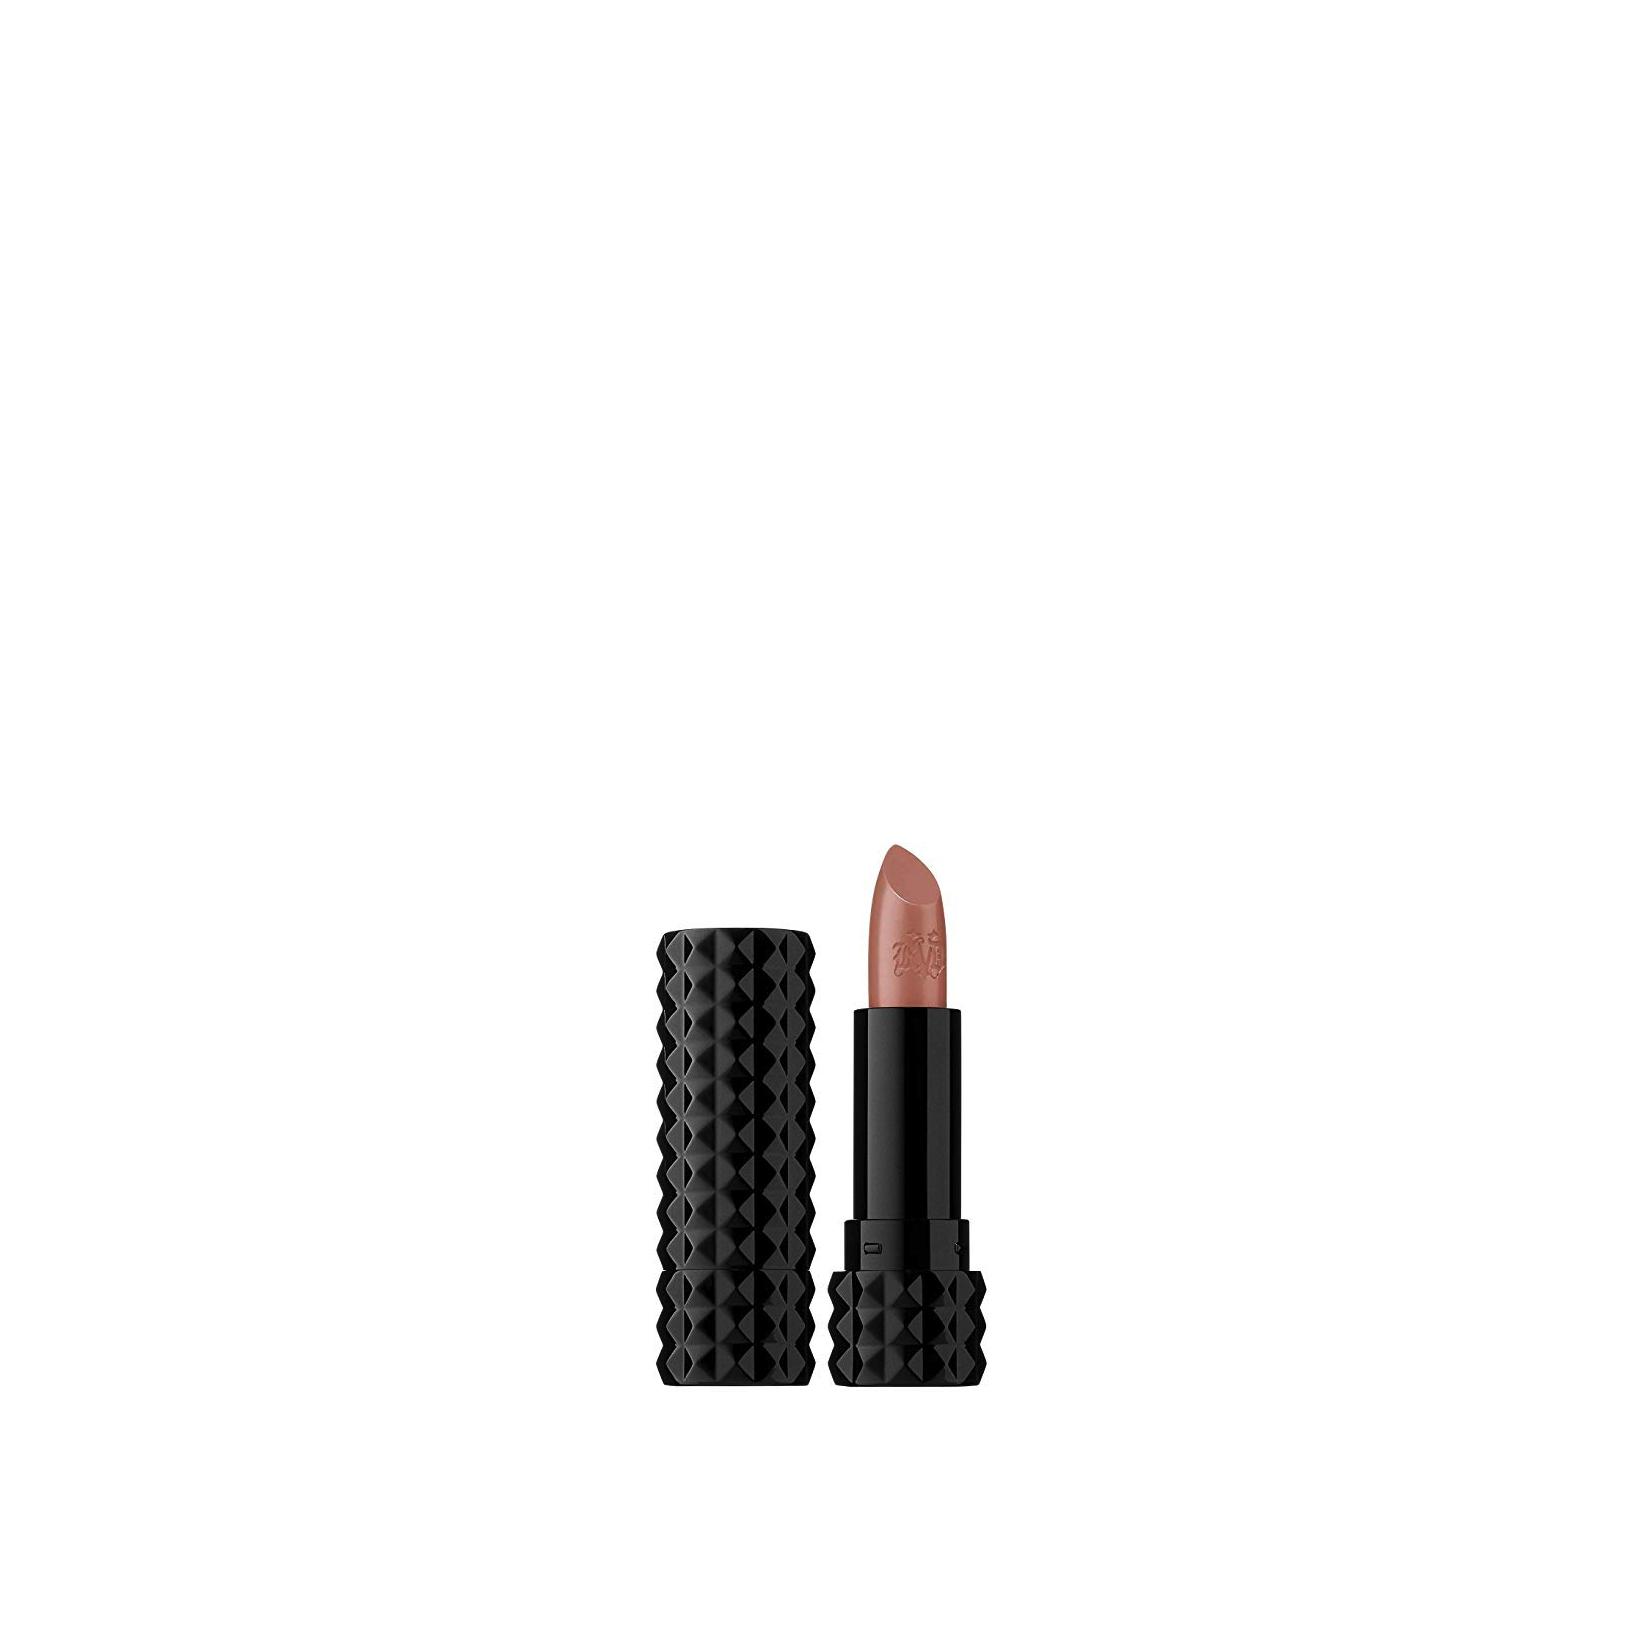 Studded Kiss Crème Lipstick